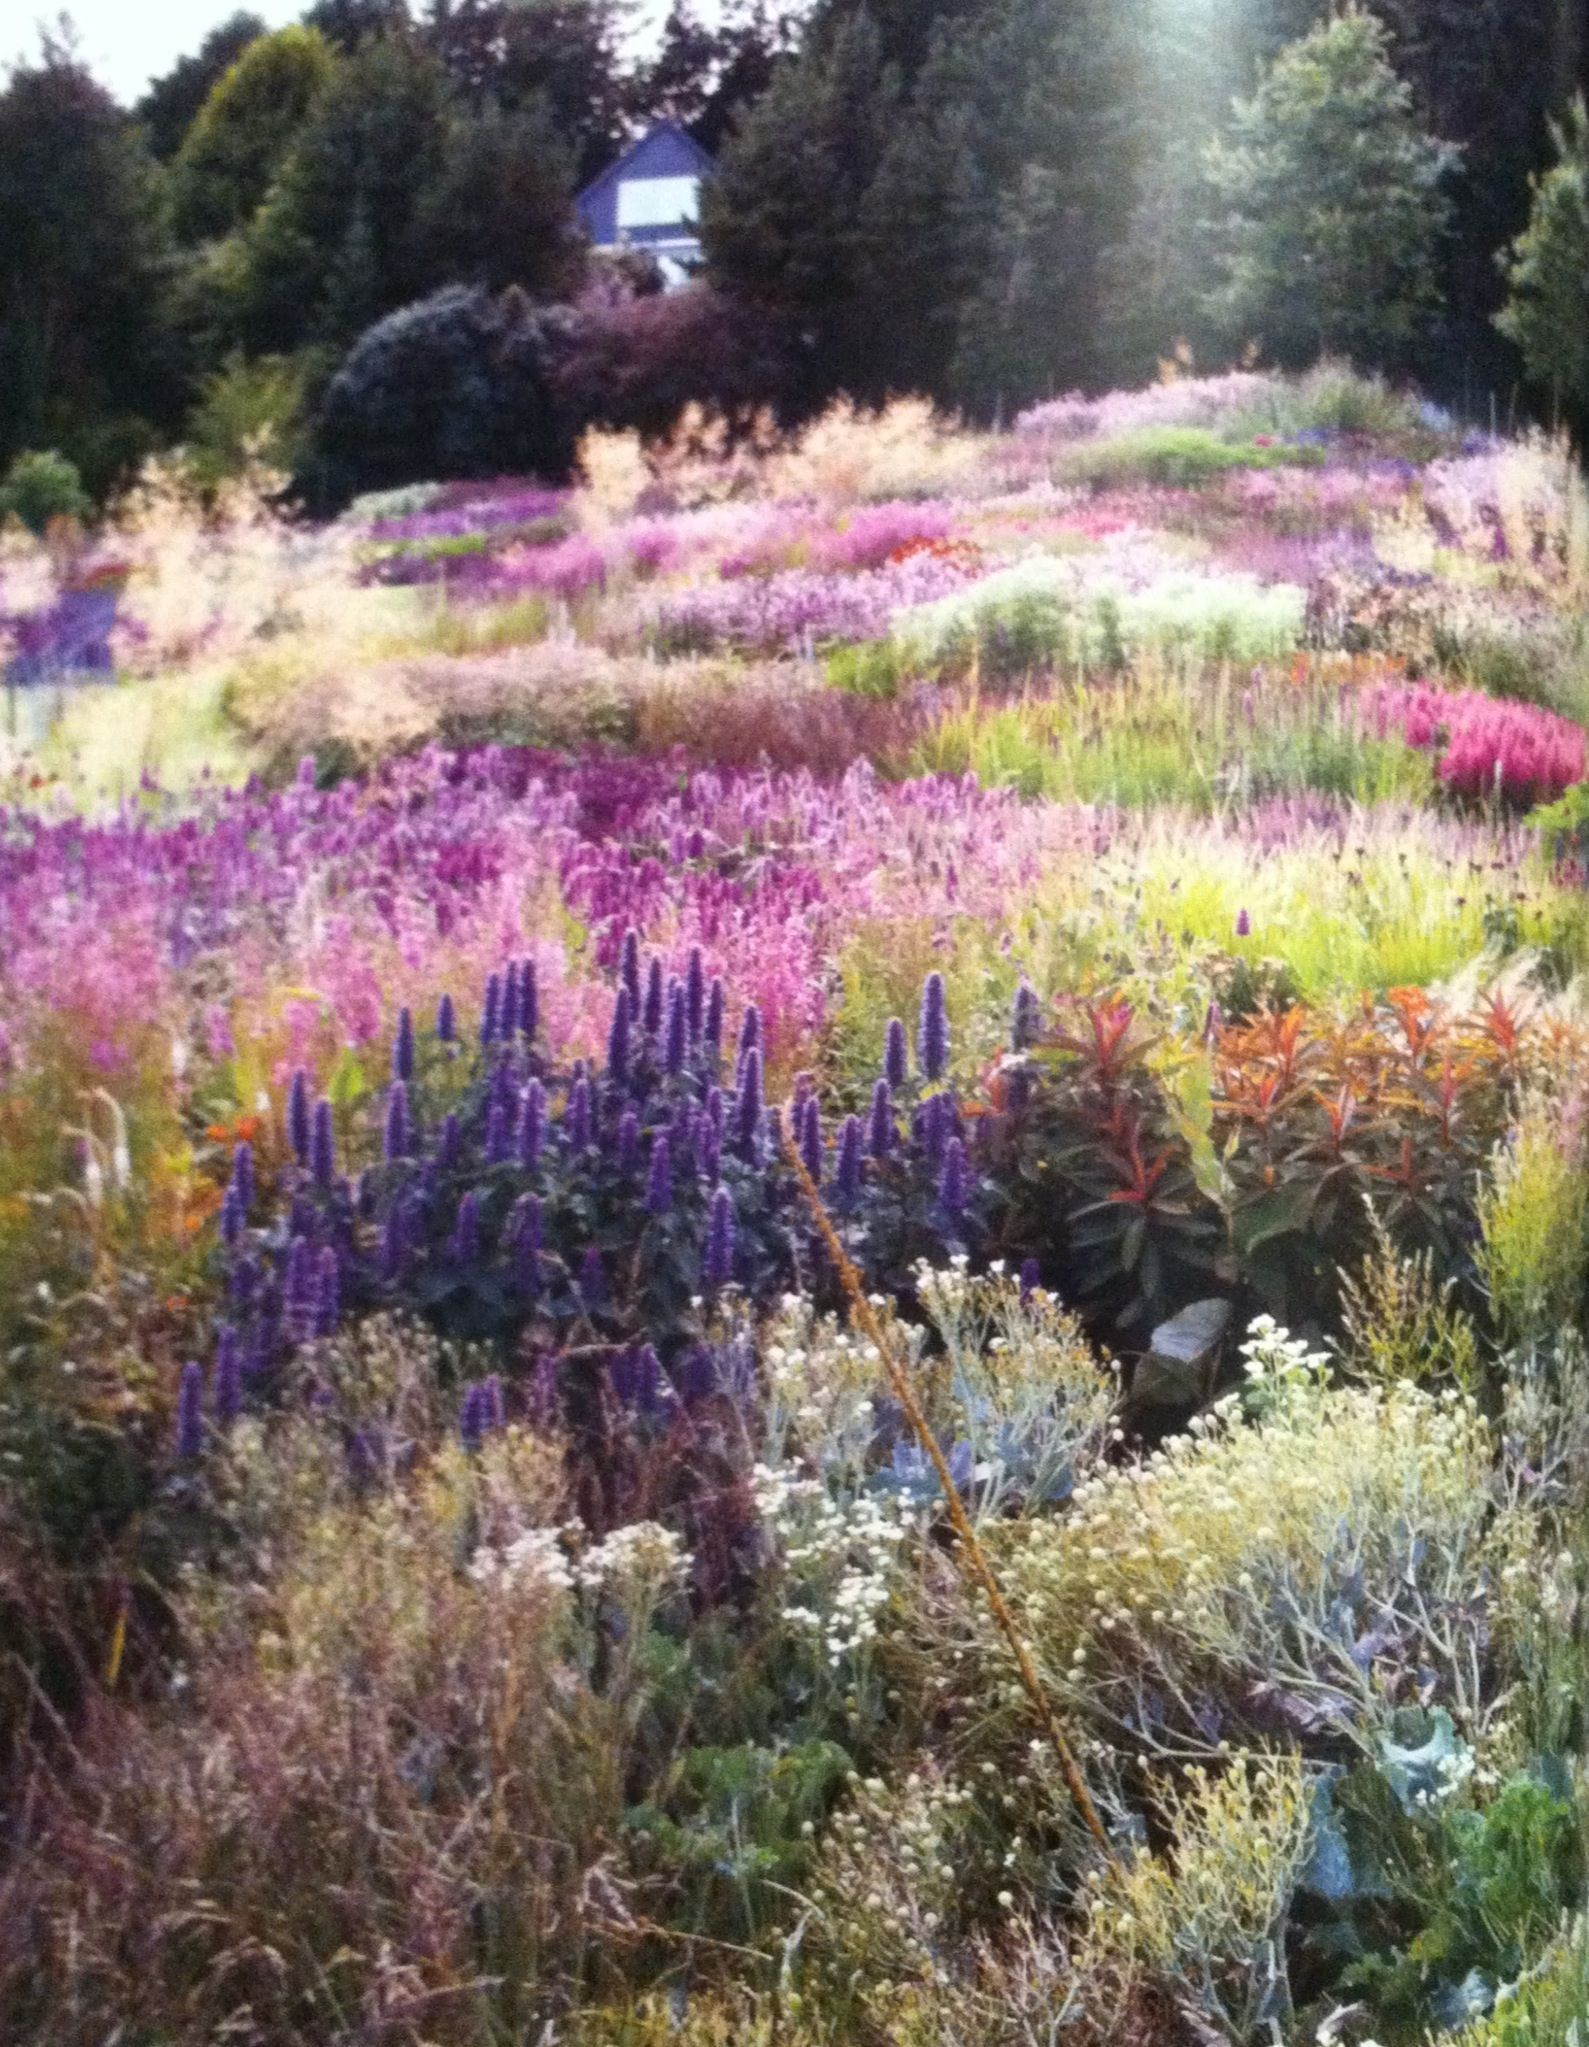 Garten Moorriem Inspirierend 23 Wildflower Garden for Your Backyard